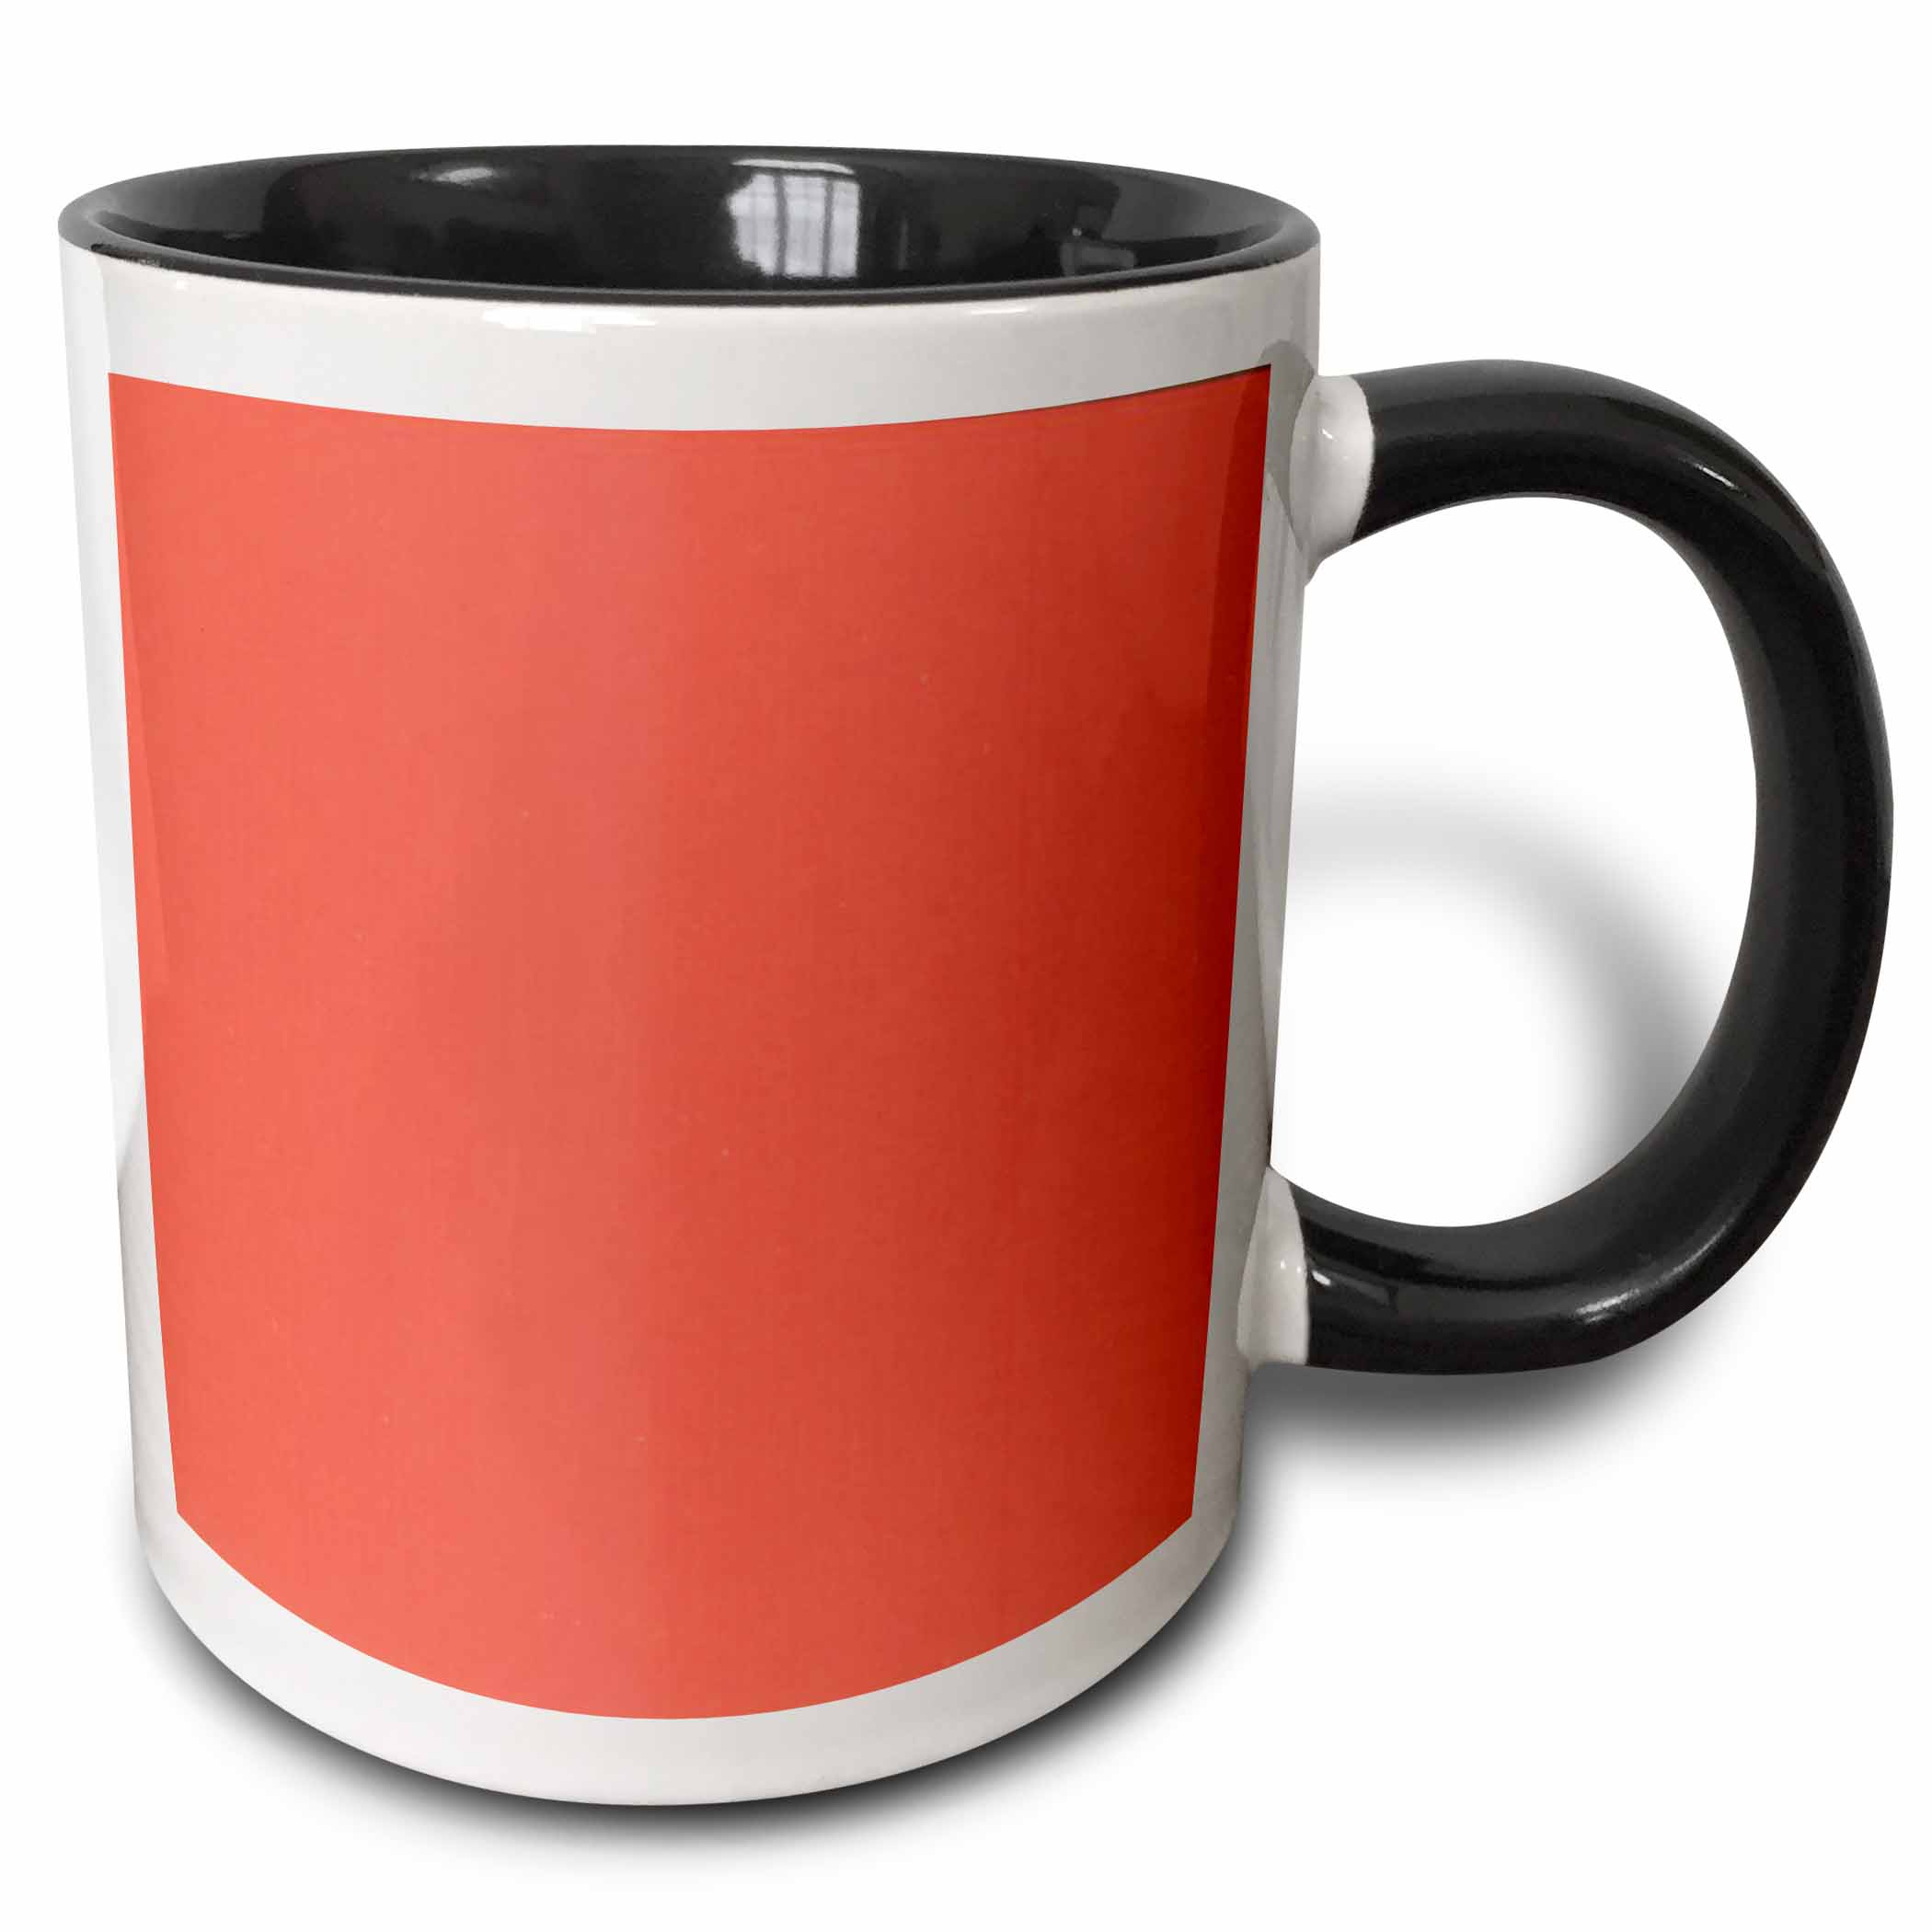 3dRose Hot Coral, Two Tone Black Mug, 11oz